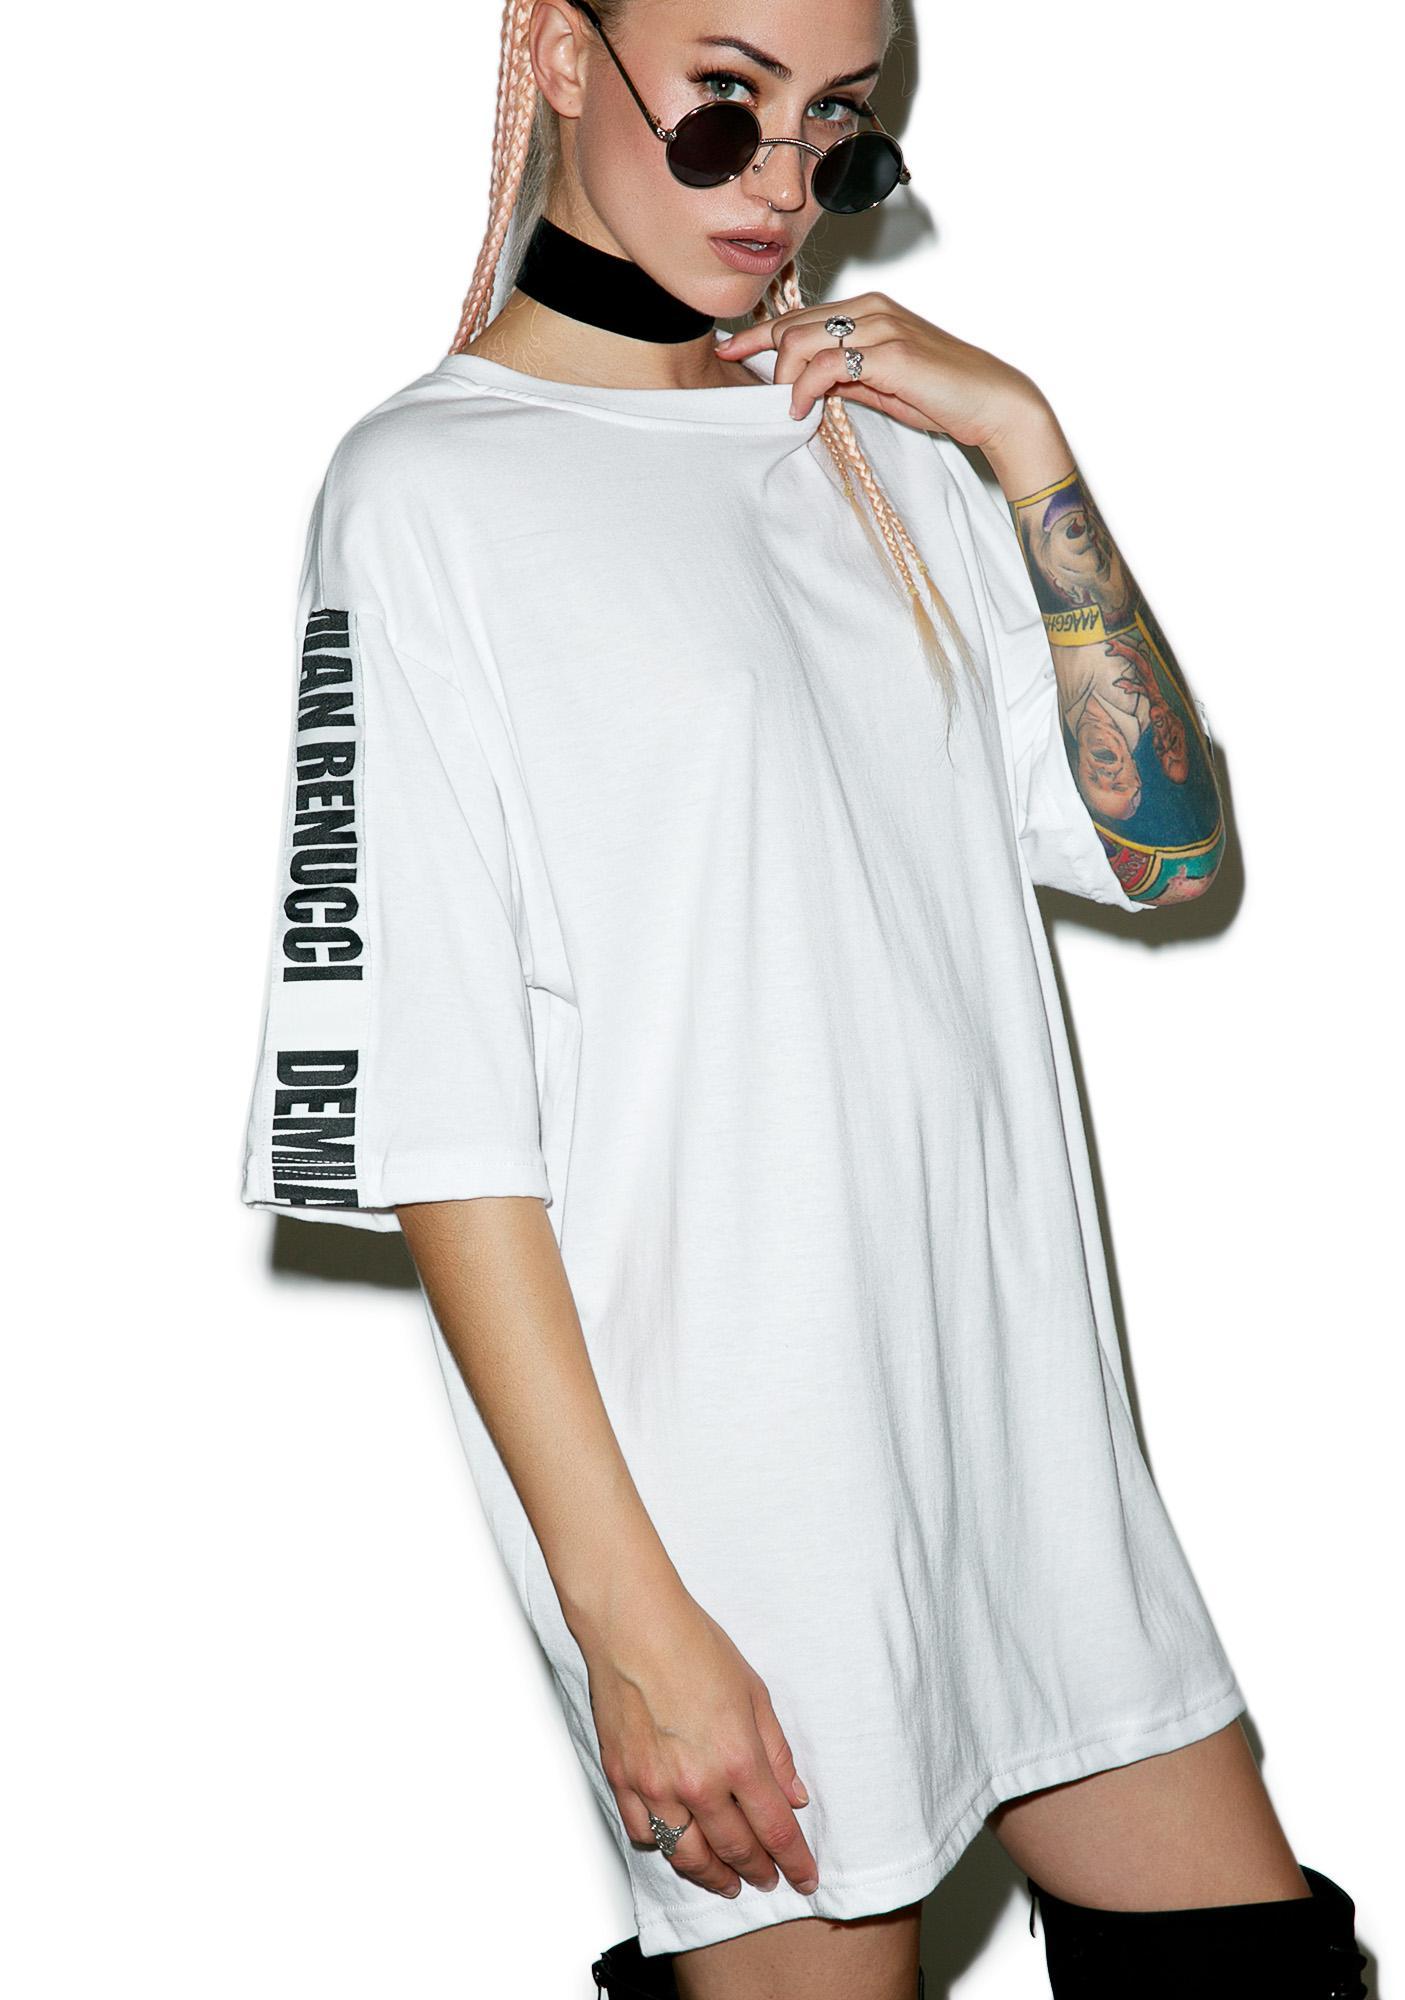 Demian Renucci Classic DR Oversize T-Shirt